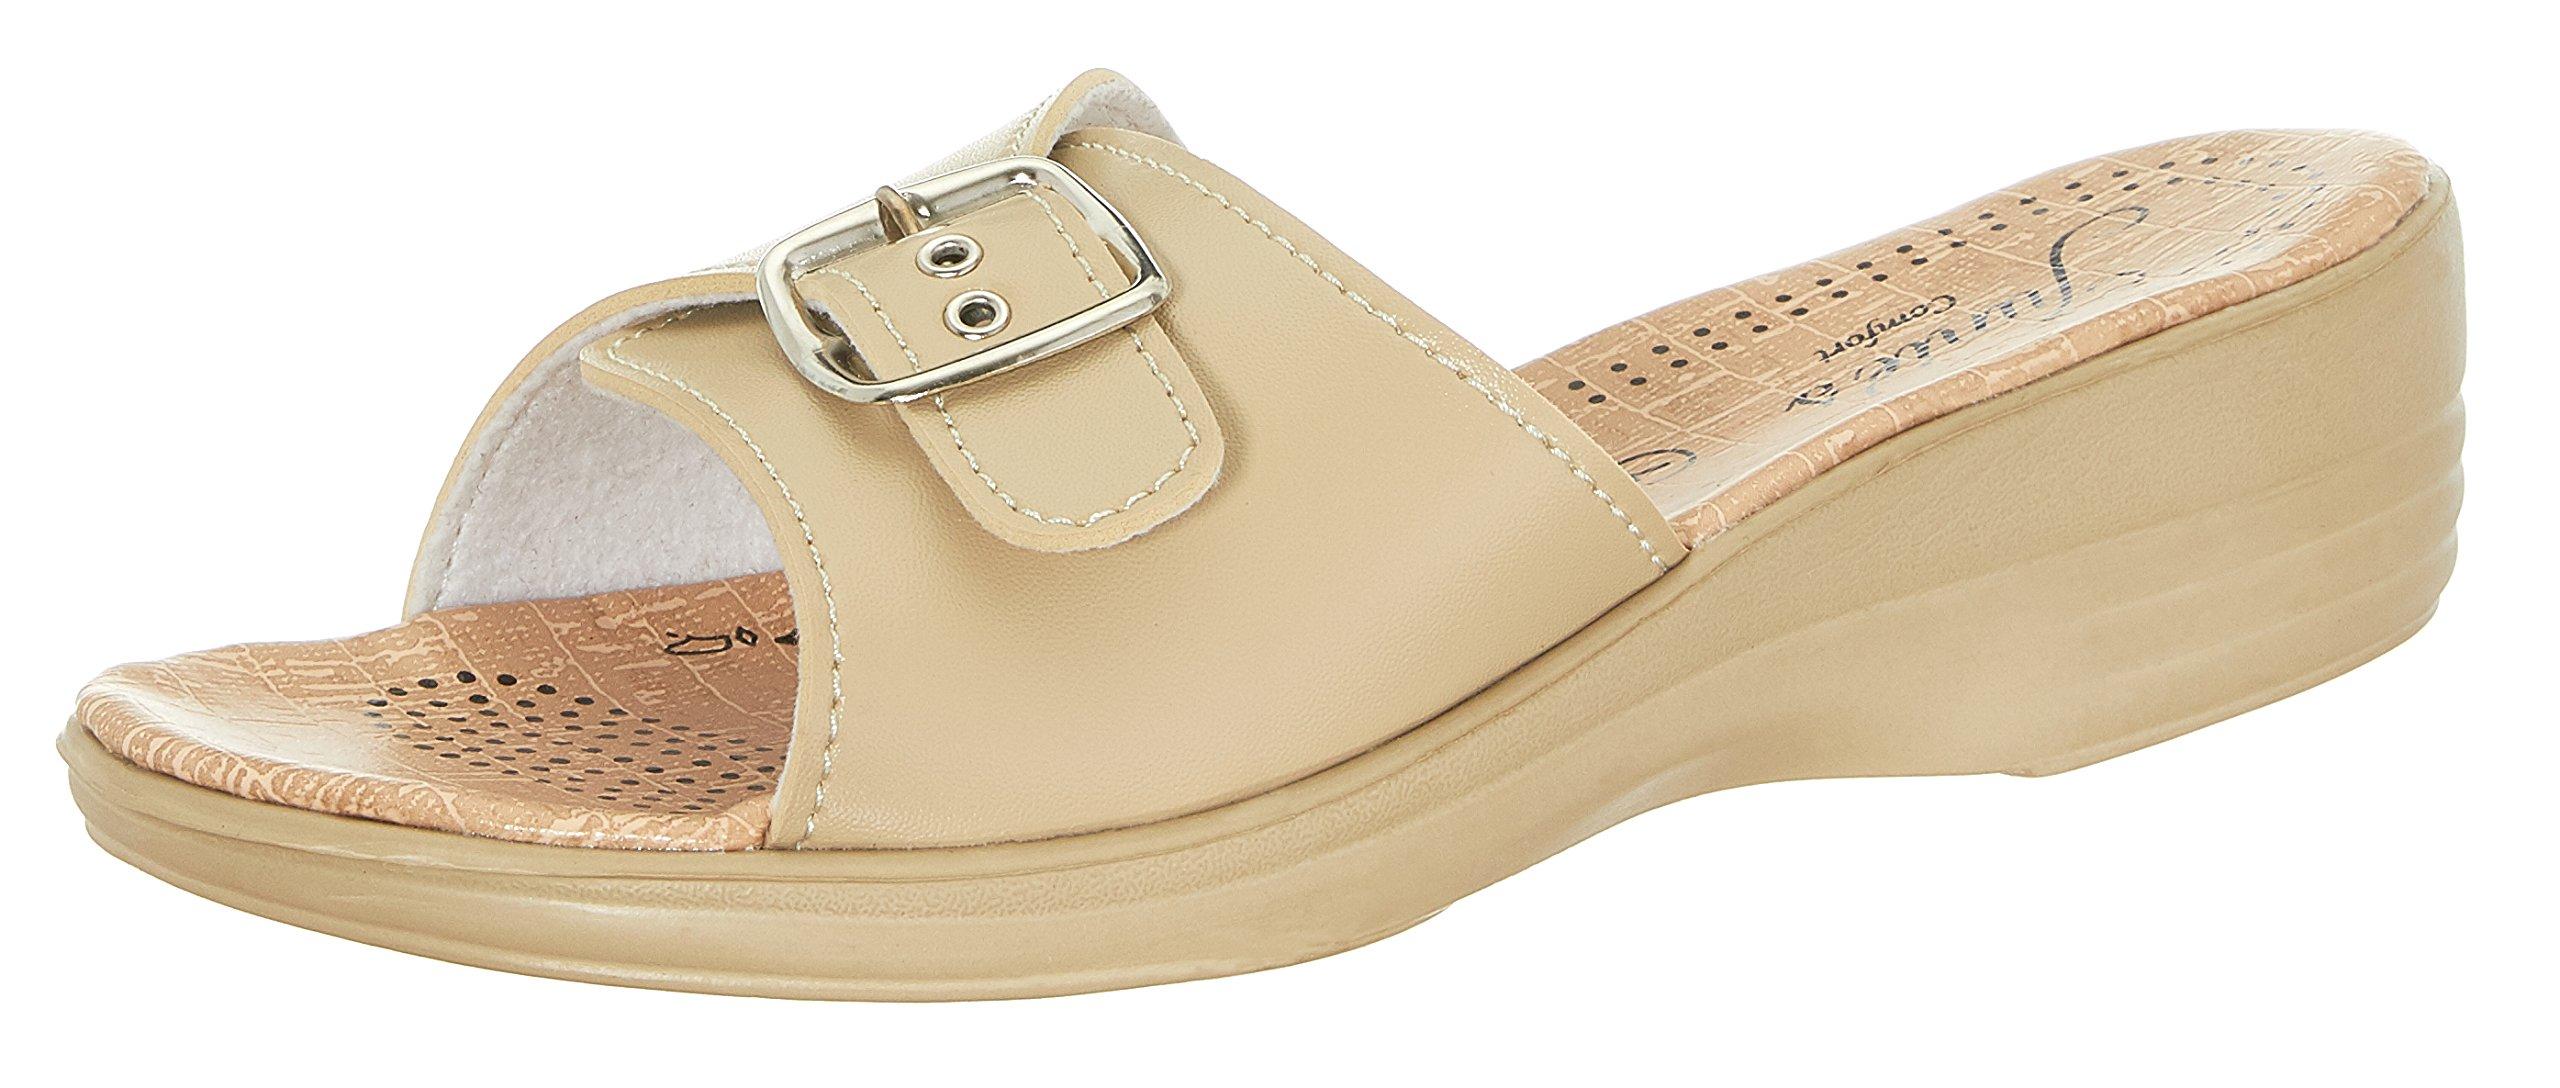 Junie's Comfort Womens Slip-on Wedge Slide Sandals, Single Buckle Accent - 7769, Beige, Size 9